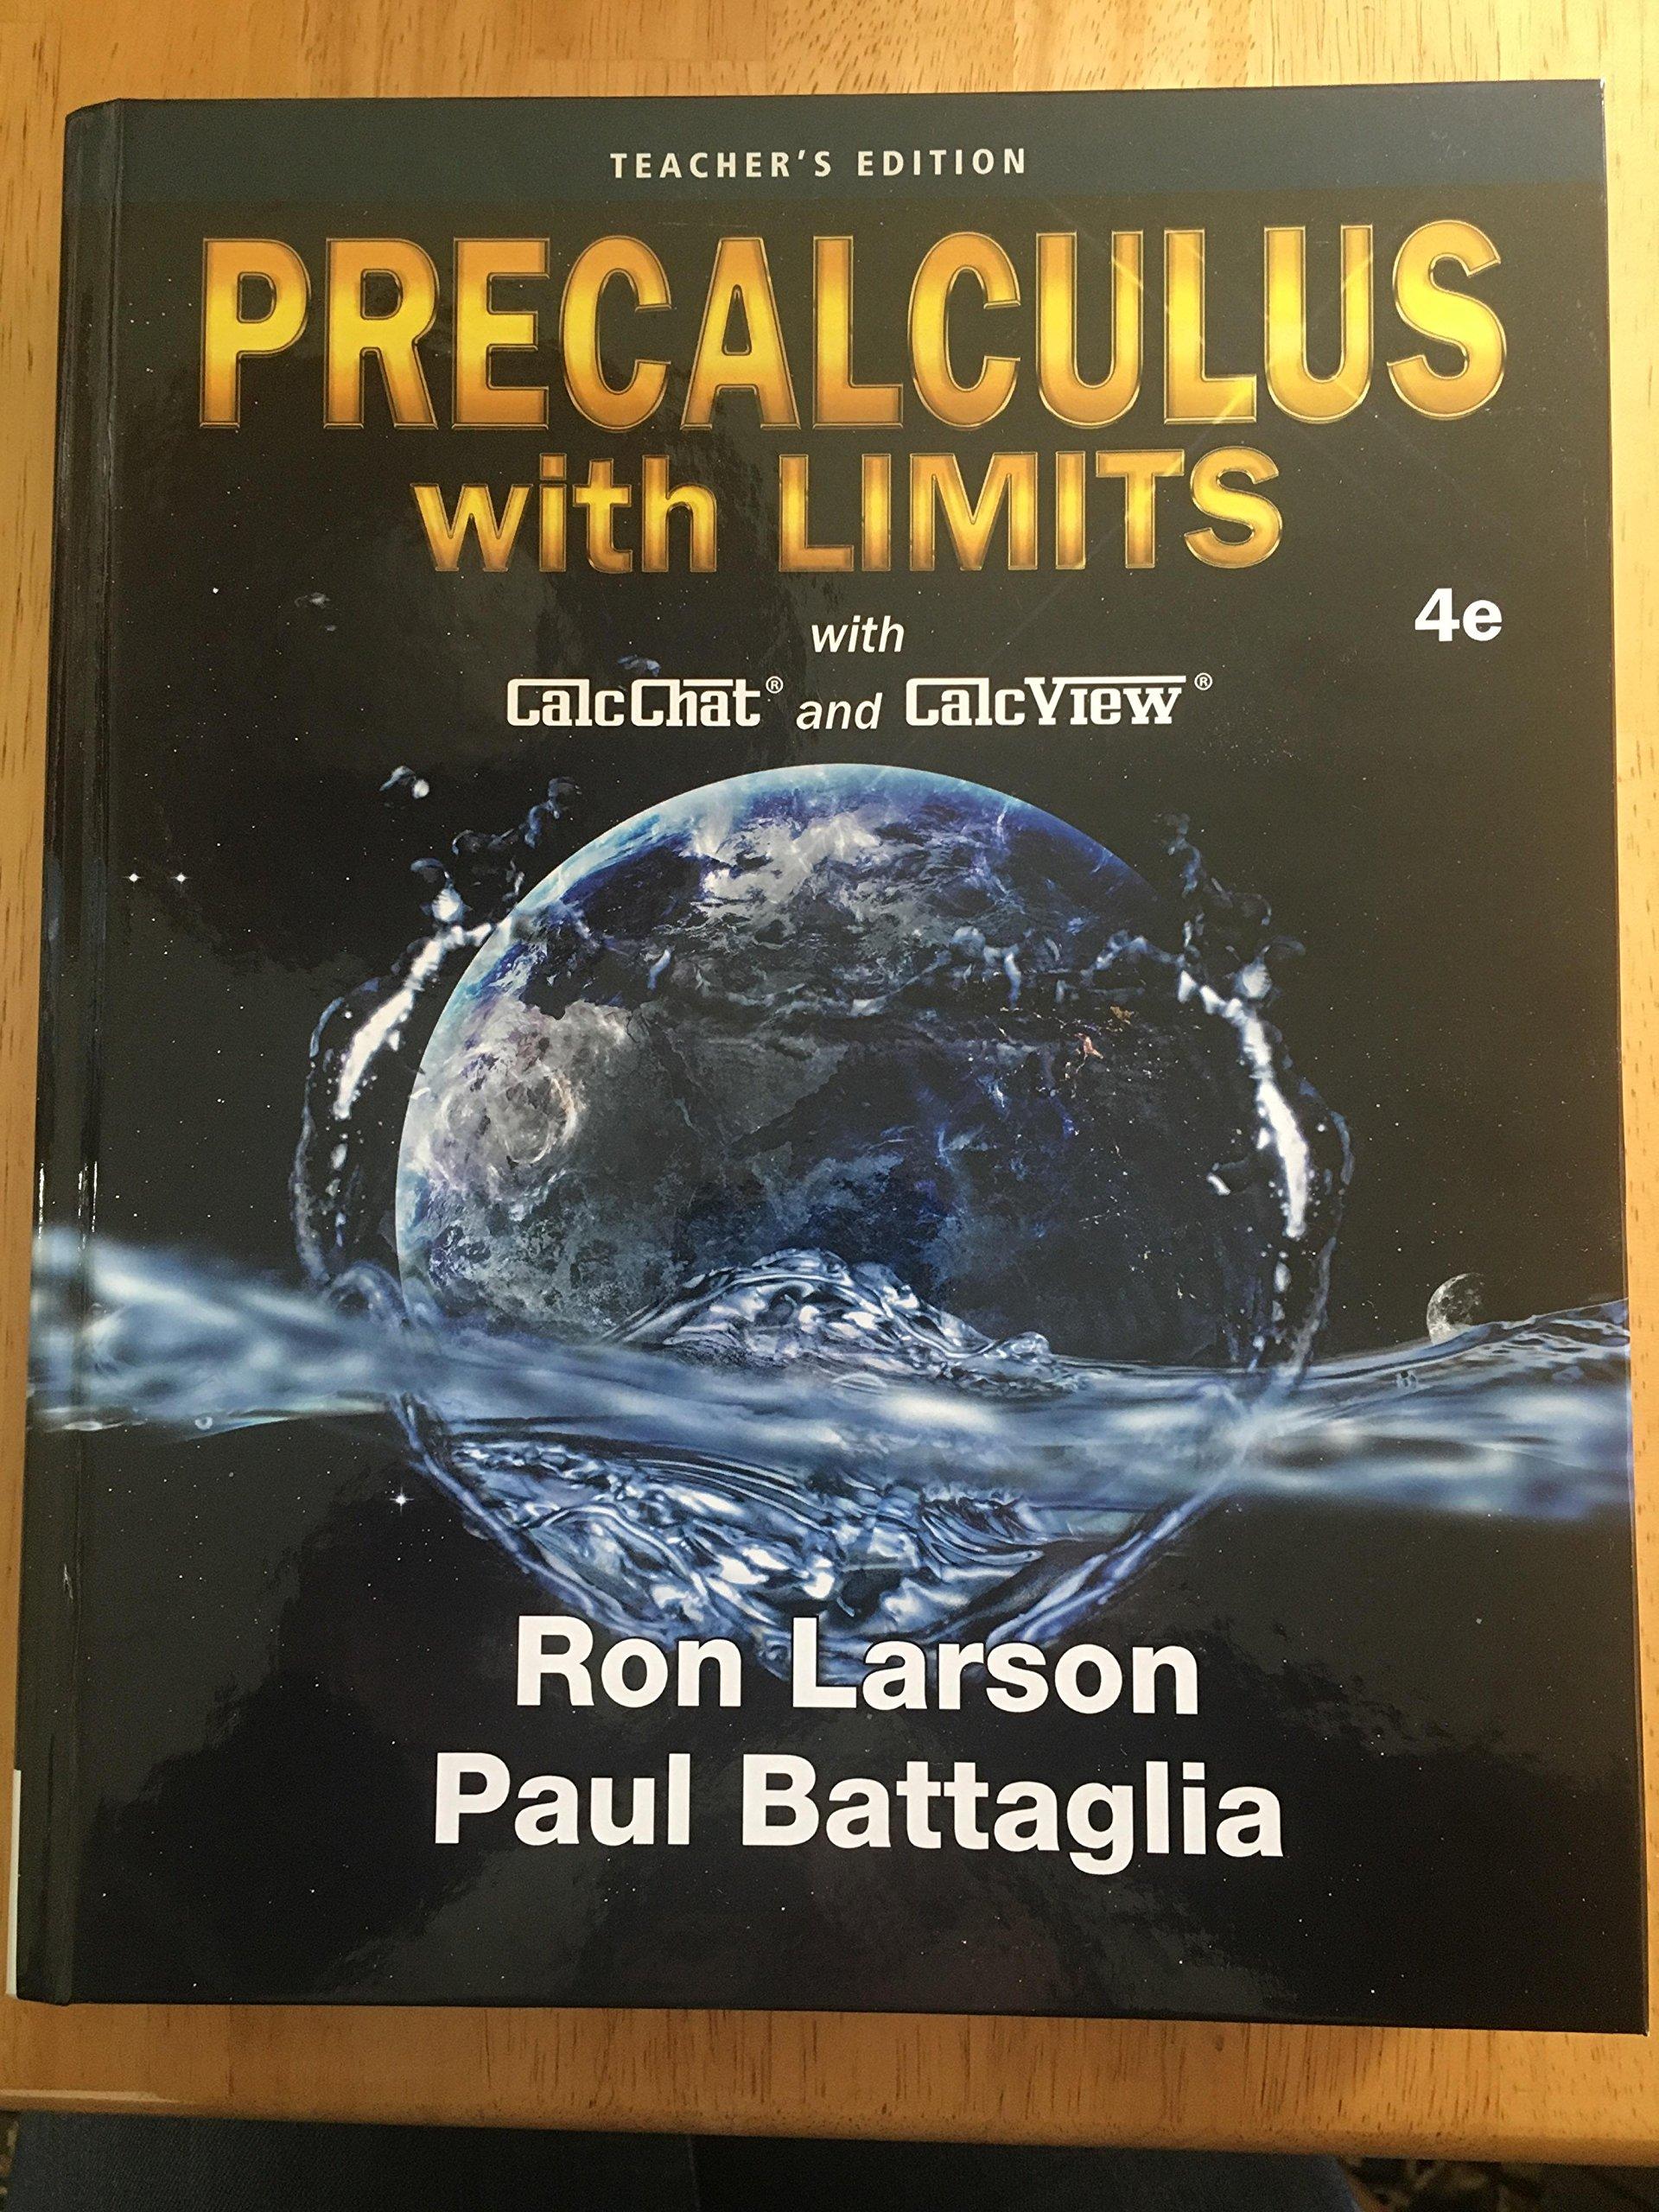 Precalculus With Limits 4e (Teachers Edition): Ron Larson